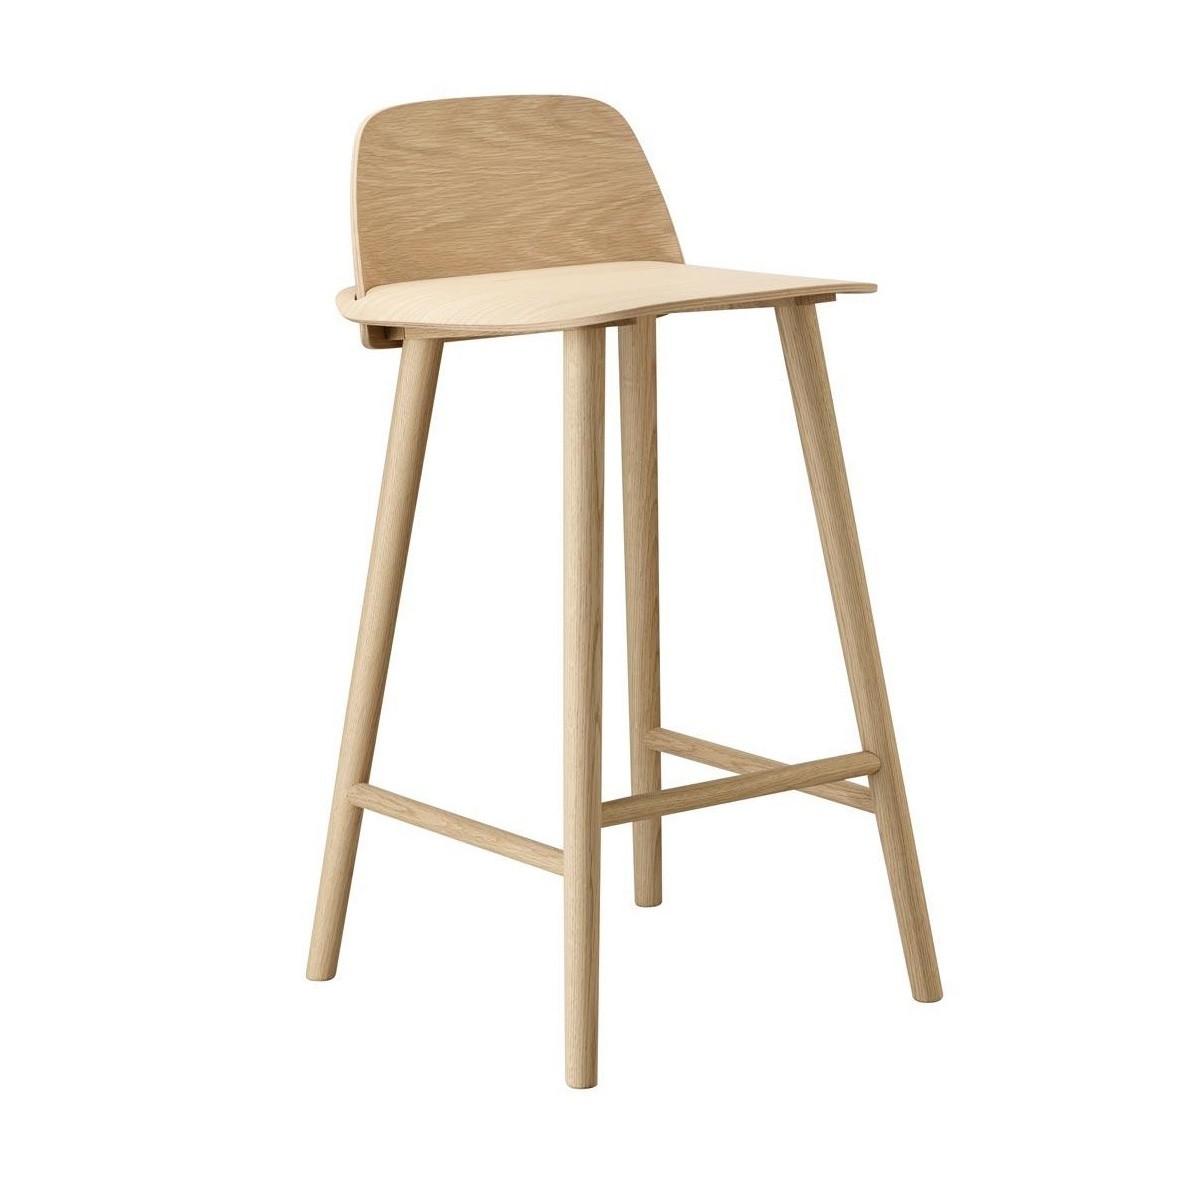 nerd chair muuto sheboygan company bar stool 65 ambientedirect